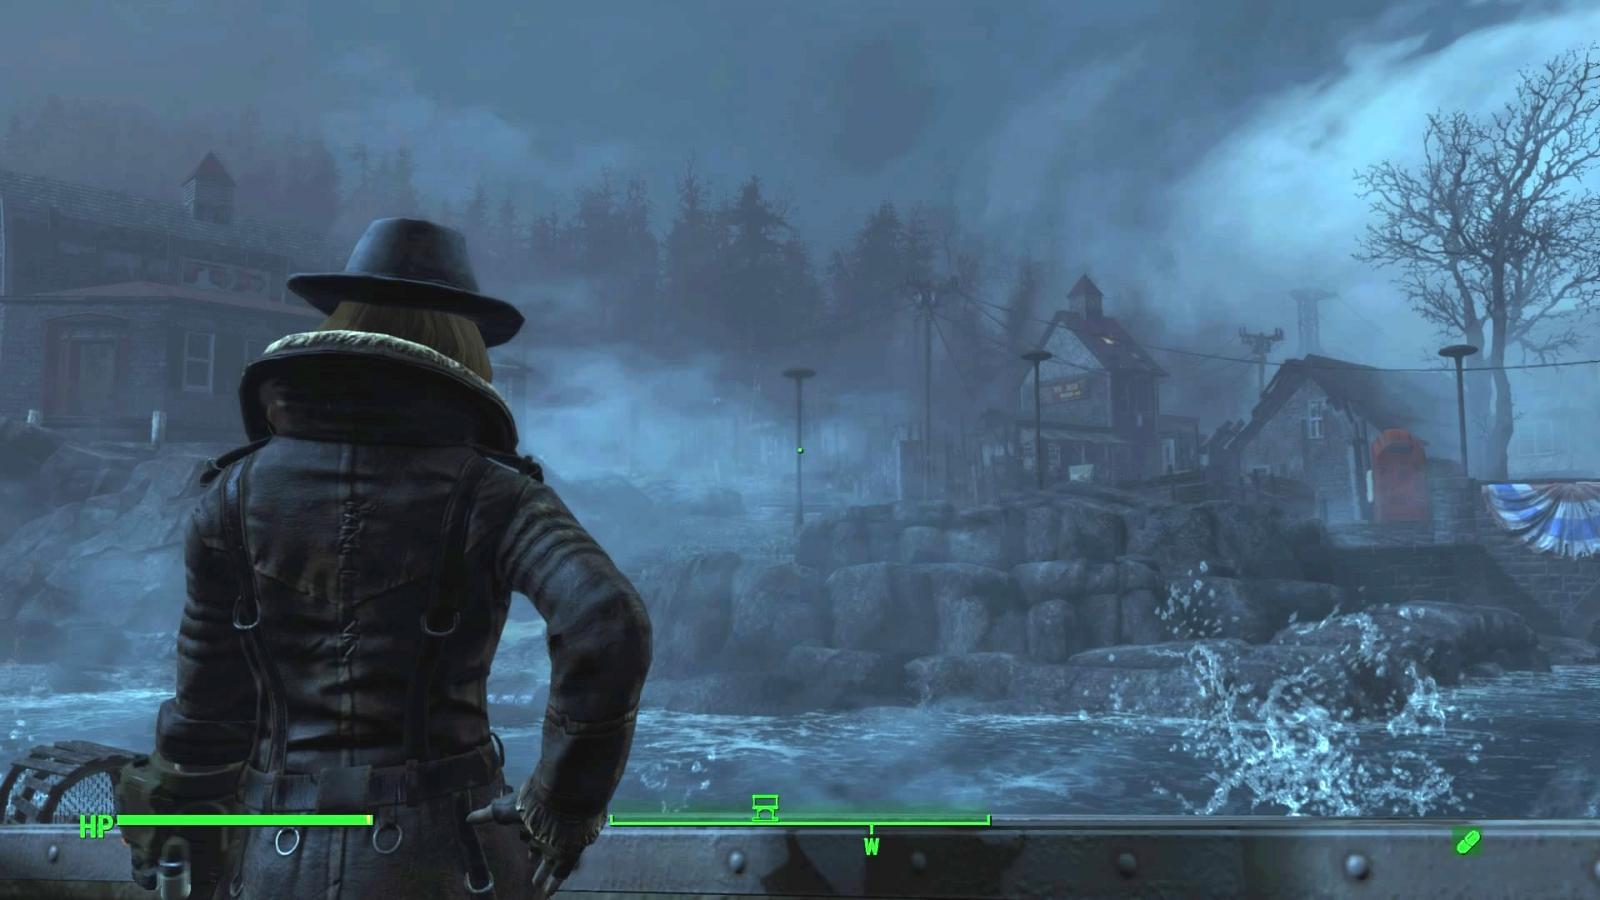 Hd Wallpapers Developer Fallout 4 Far Harbor Dlc Review Bethesda S Shallow